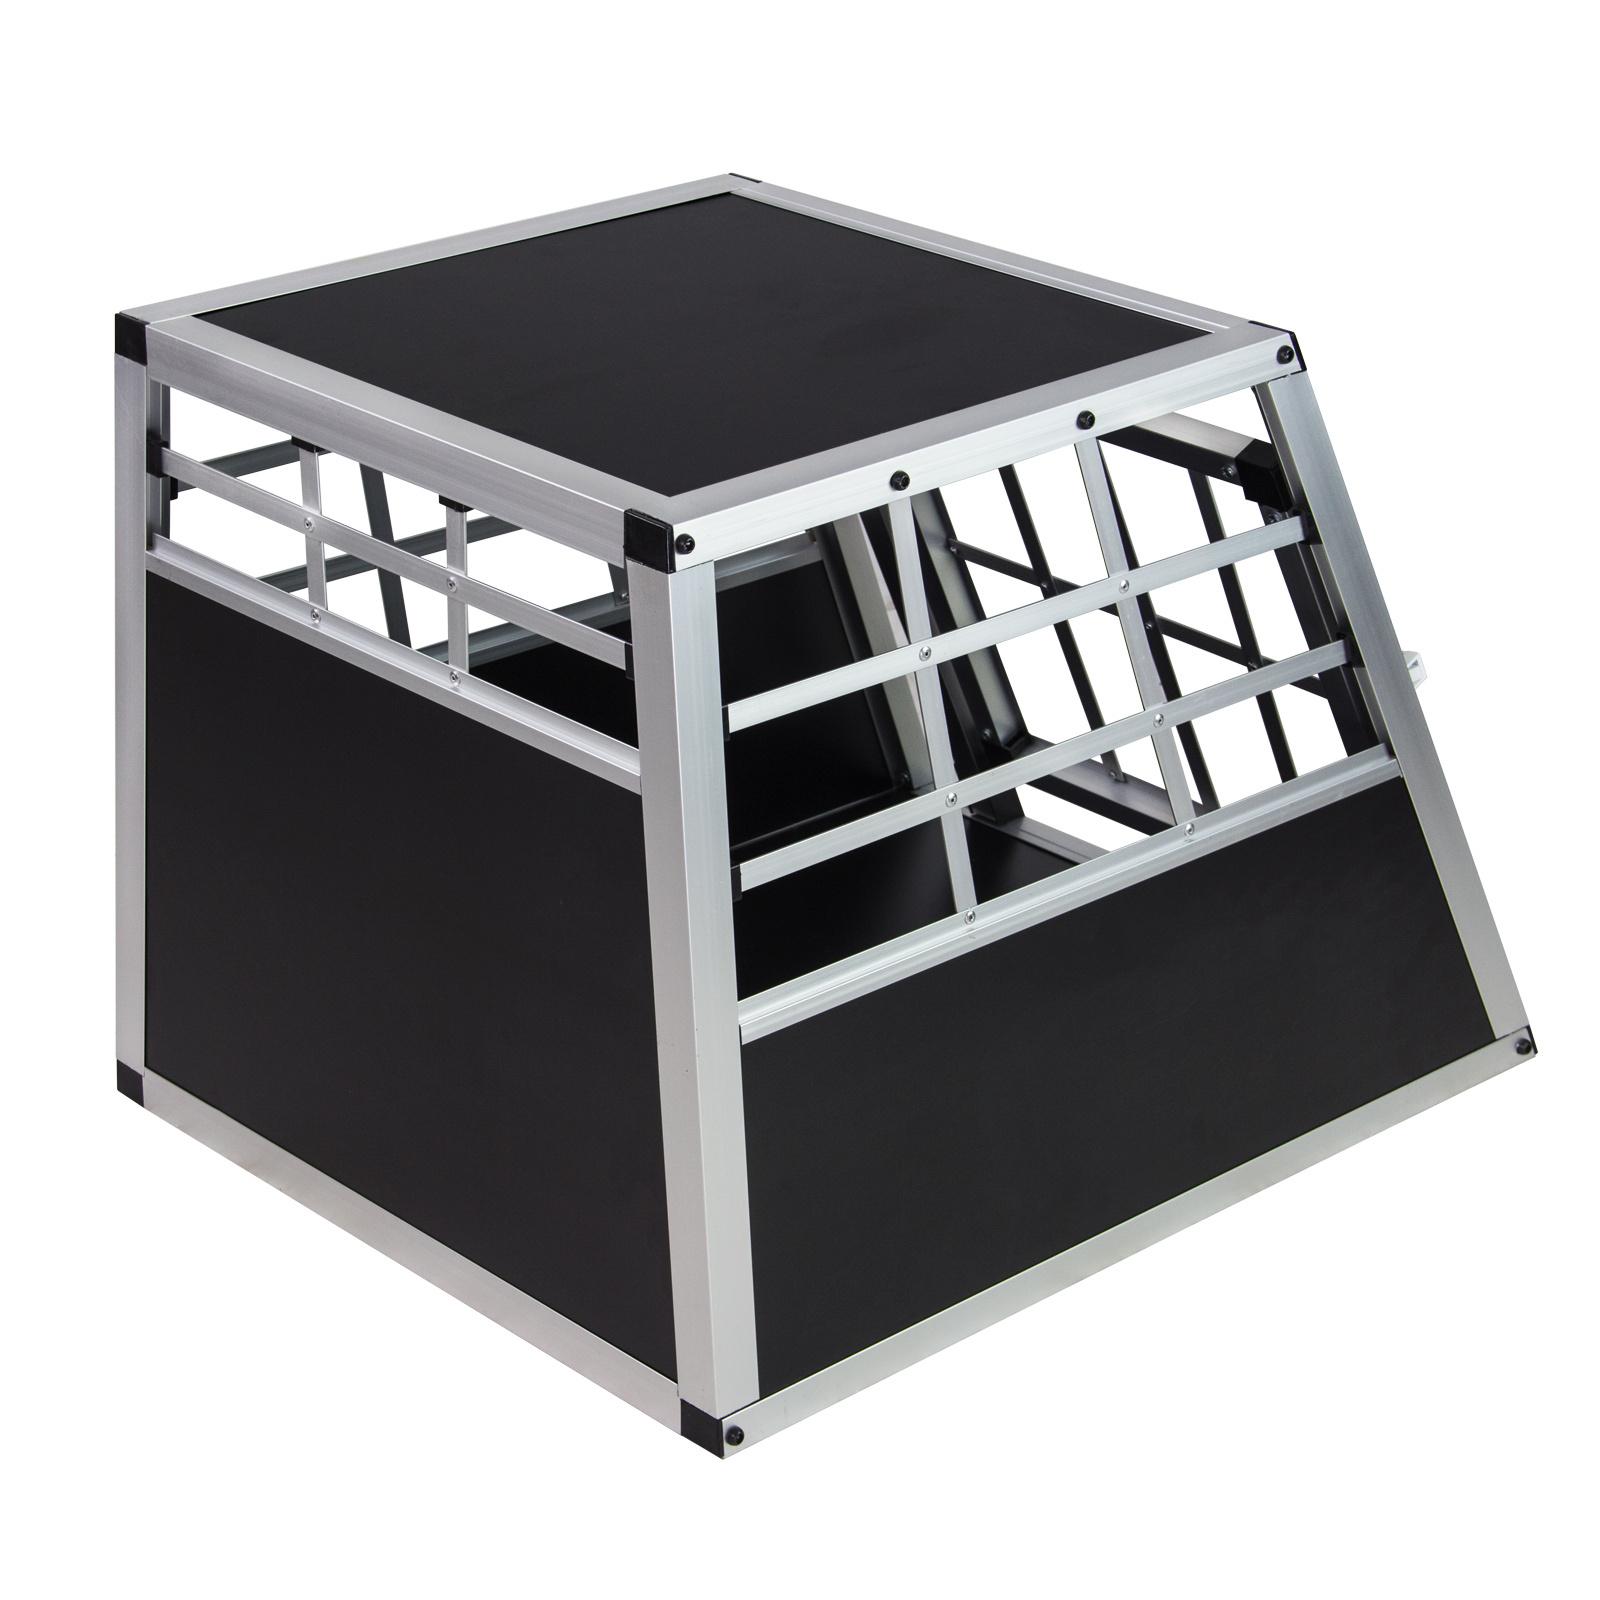 hunde auto transportbox hundetransportbox autotransportbox 54x69x51 cm schwarz ebay. Black Bedroom Furniture Sets. Home Design Ideas